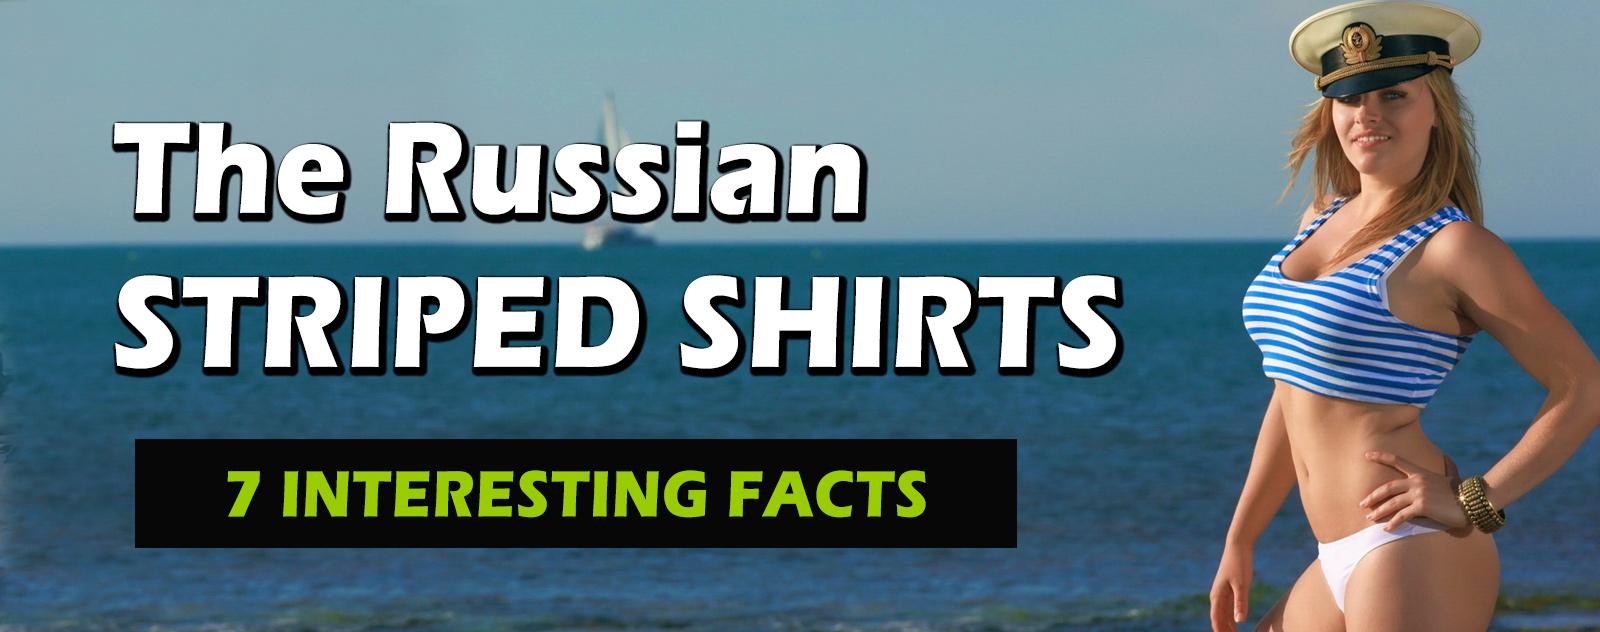 Russian Striped Shirts